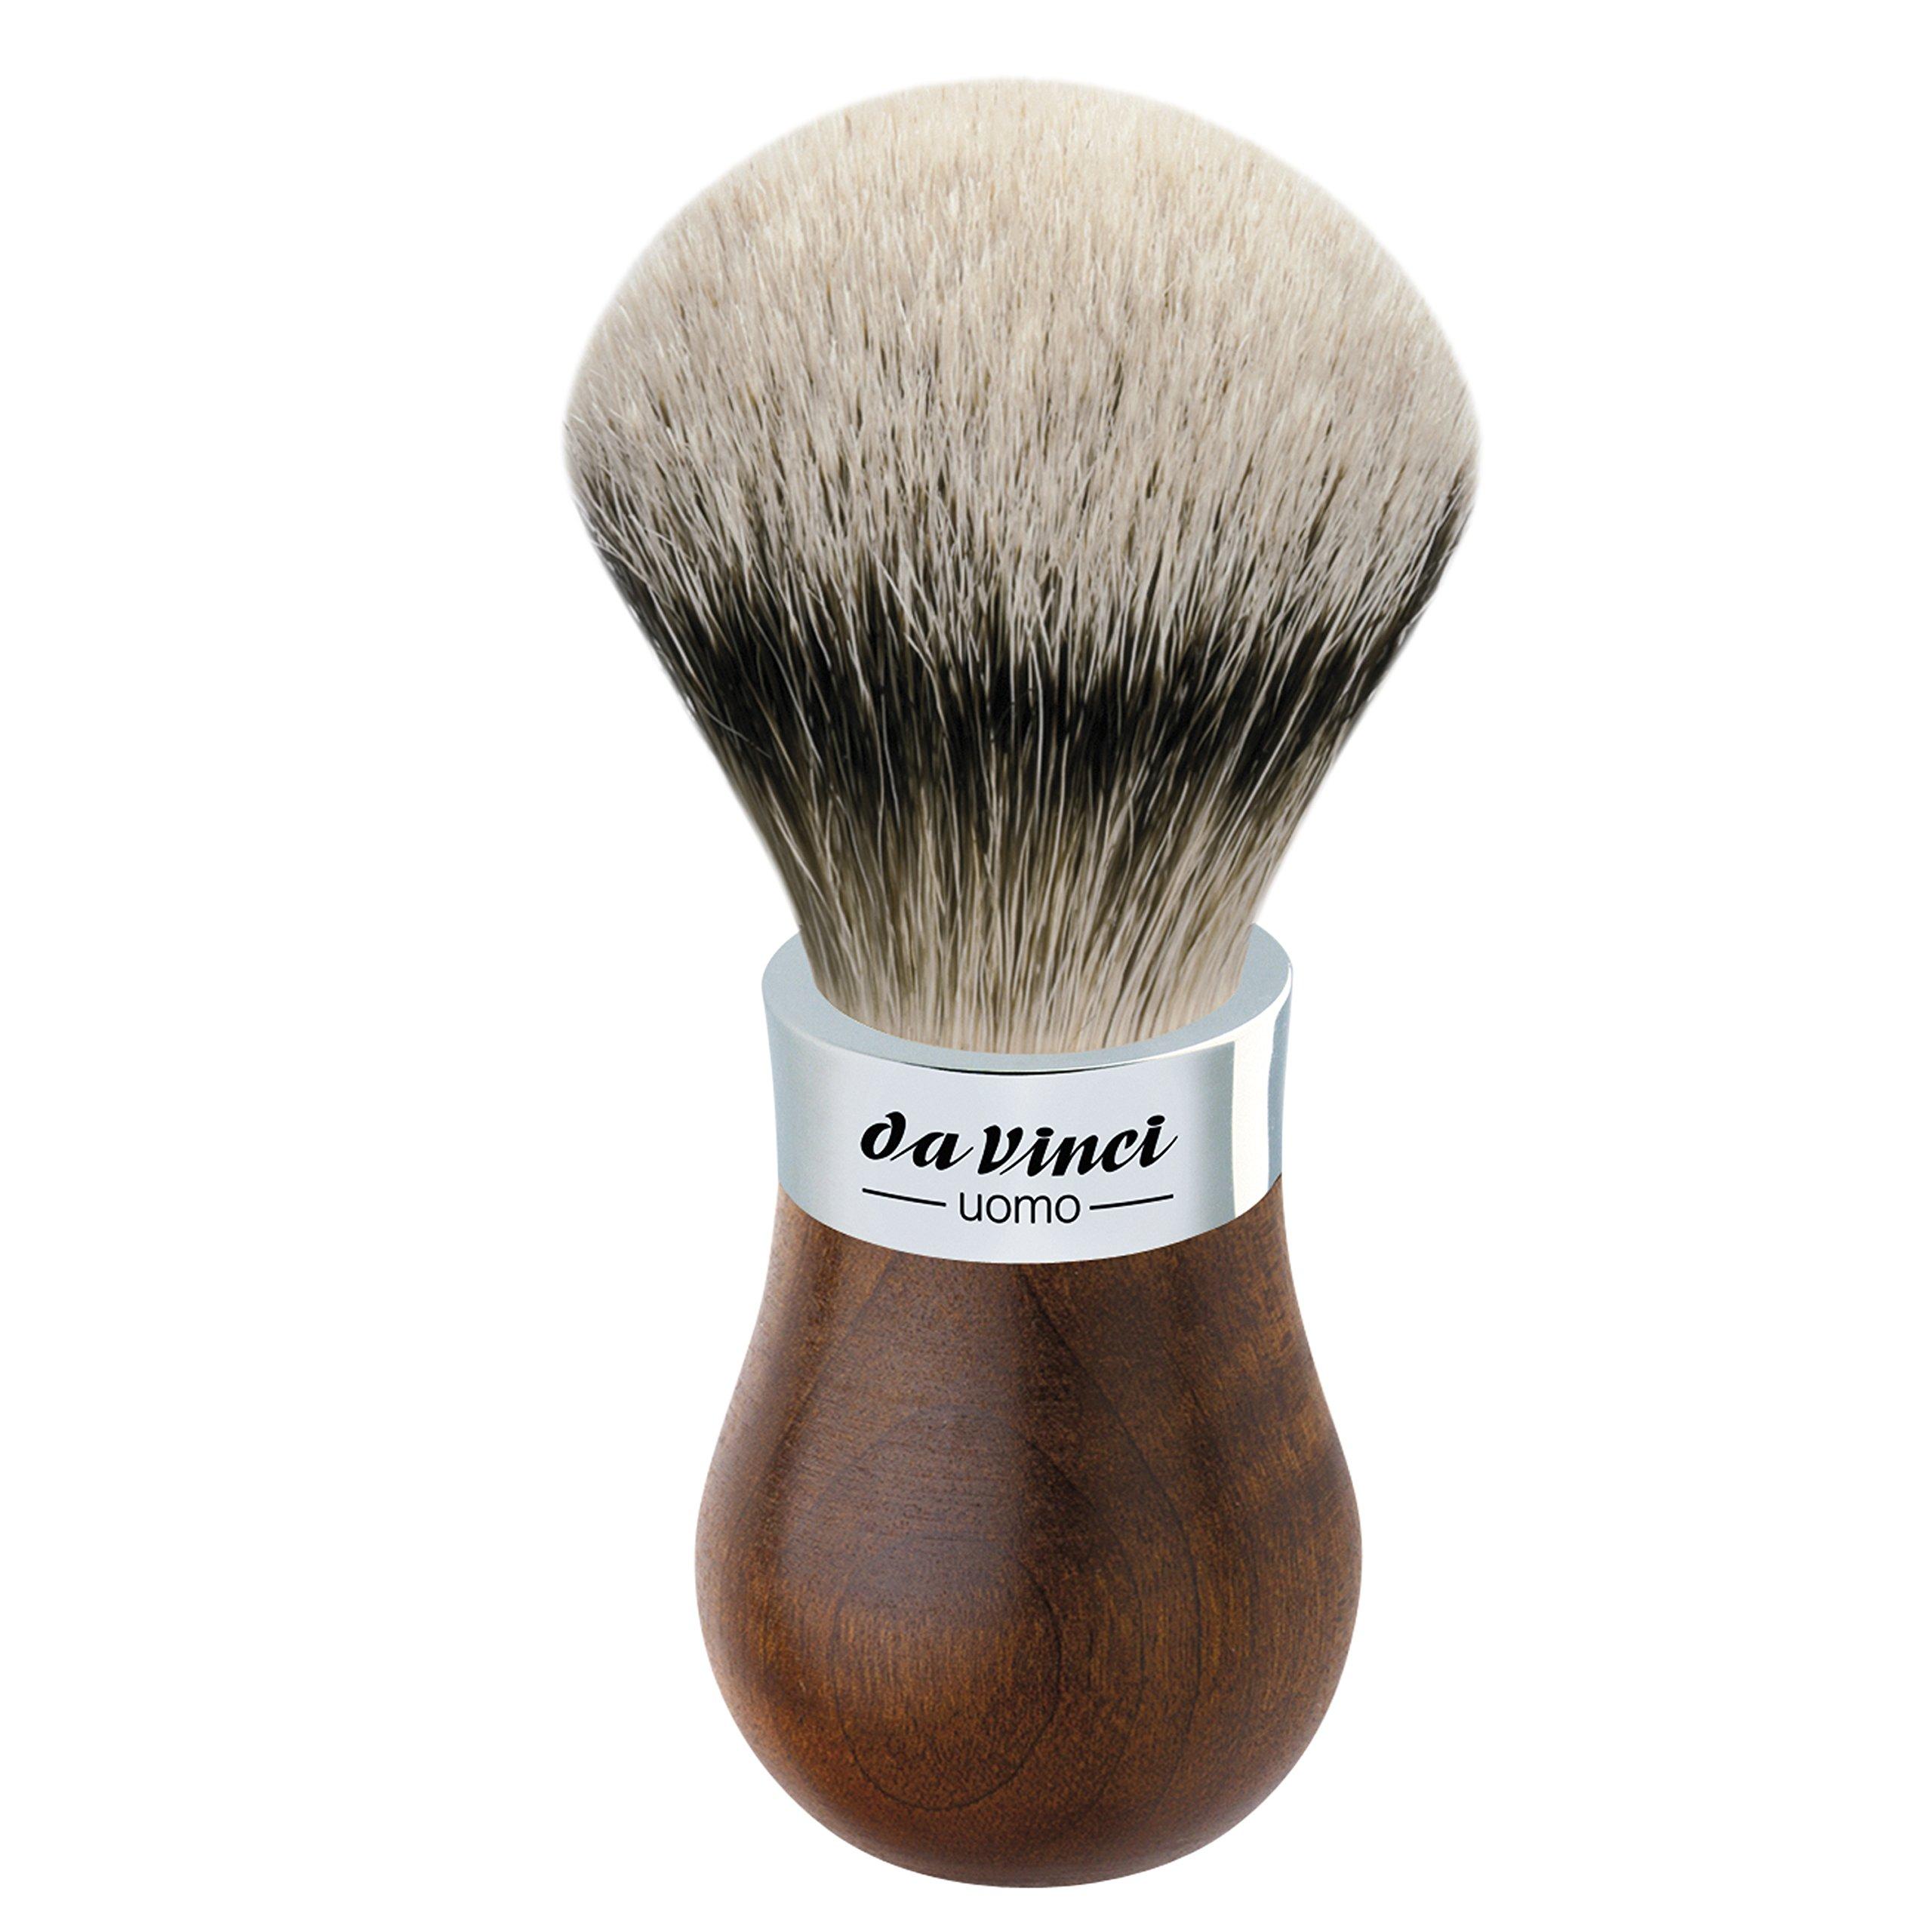 da Vinci Shaving Series 299 UOMO Silvertip Shaving Brush, Badger Hair with Kebony Wood Handle, 22mm, 57 Gram